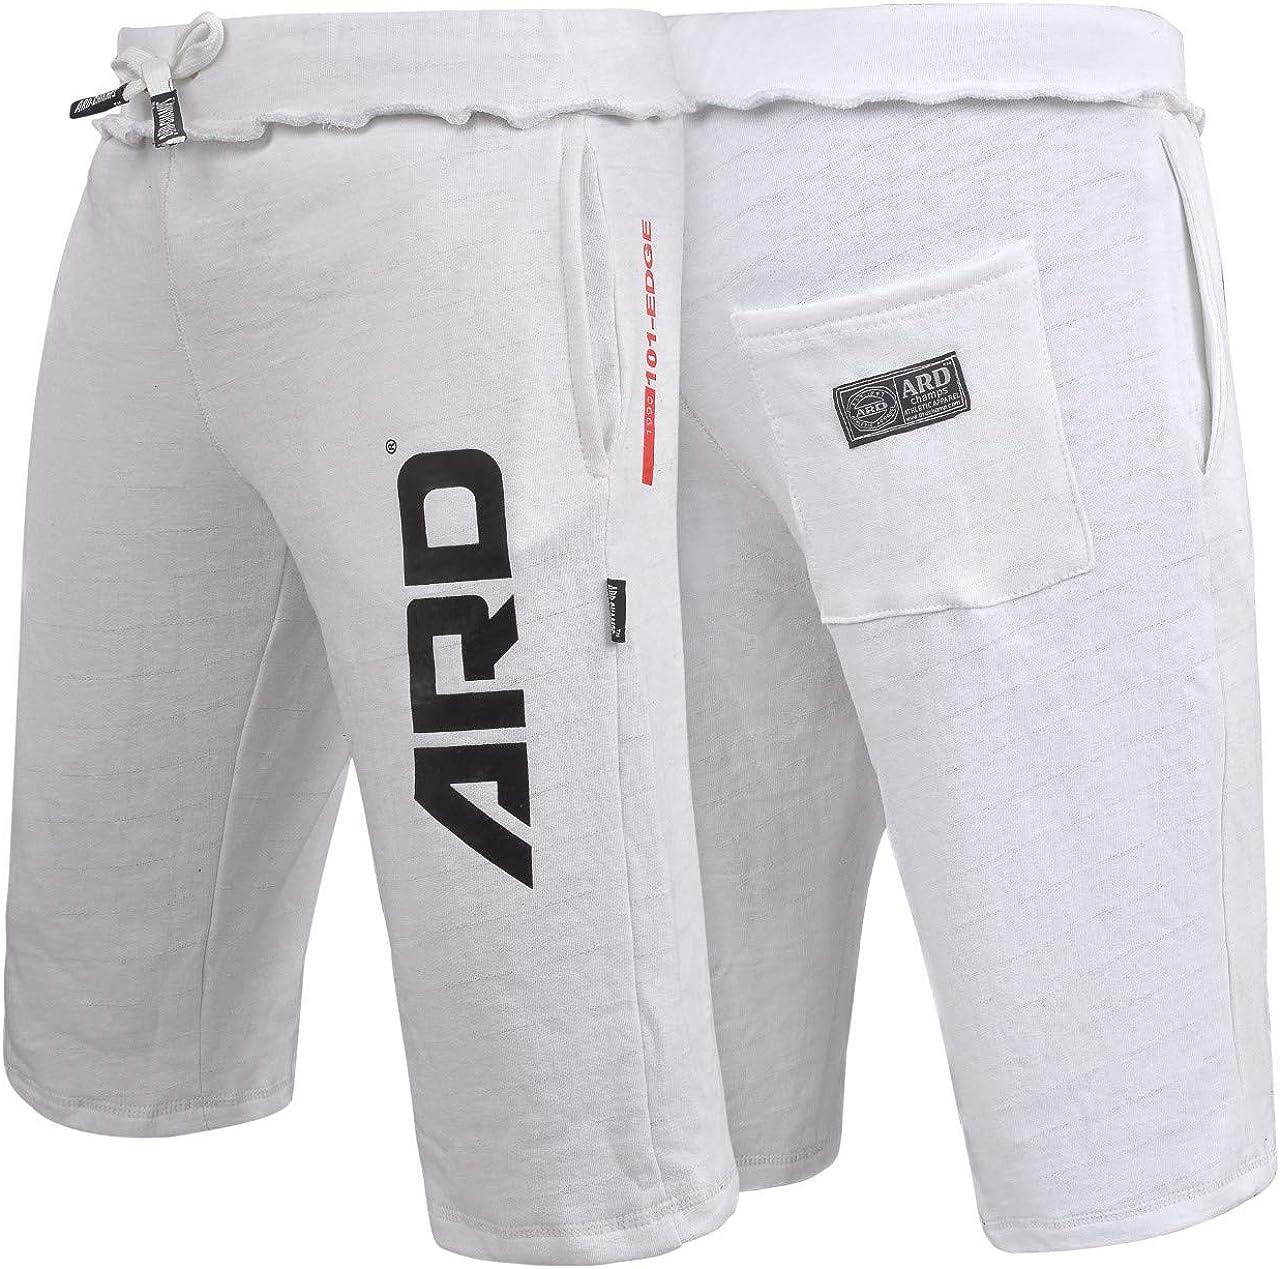 ARD CHAMPS Mens Cotton Fleece Shorts Jogging Casual Home Wear MMA Boxing Martial Art Jogger (S-XXL) (White, Medium)